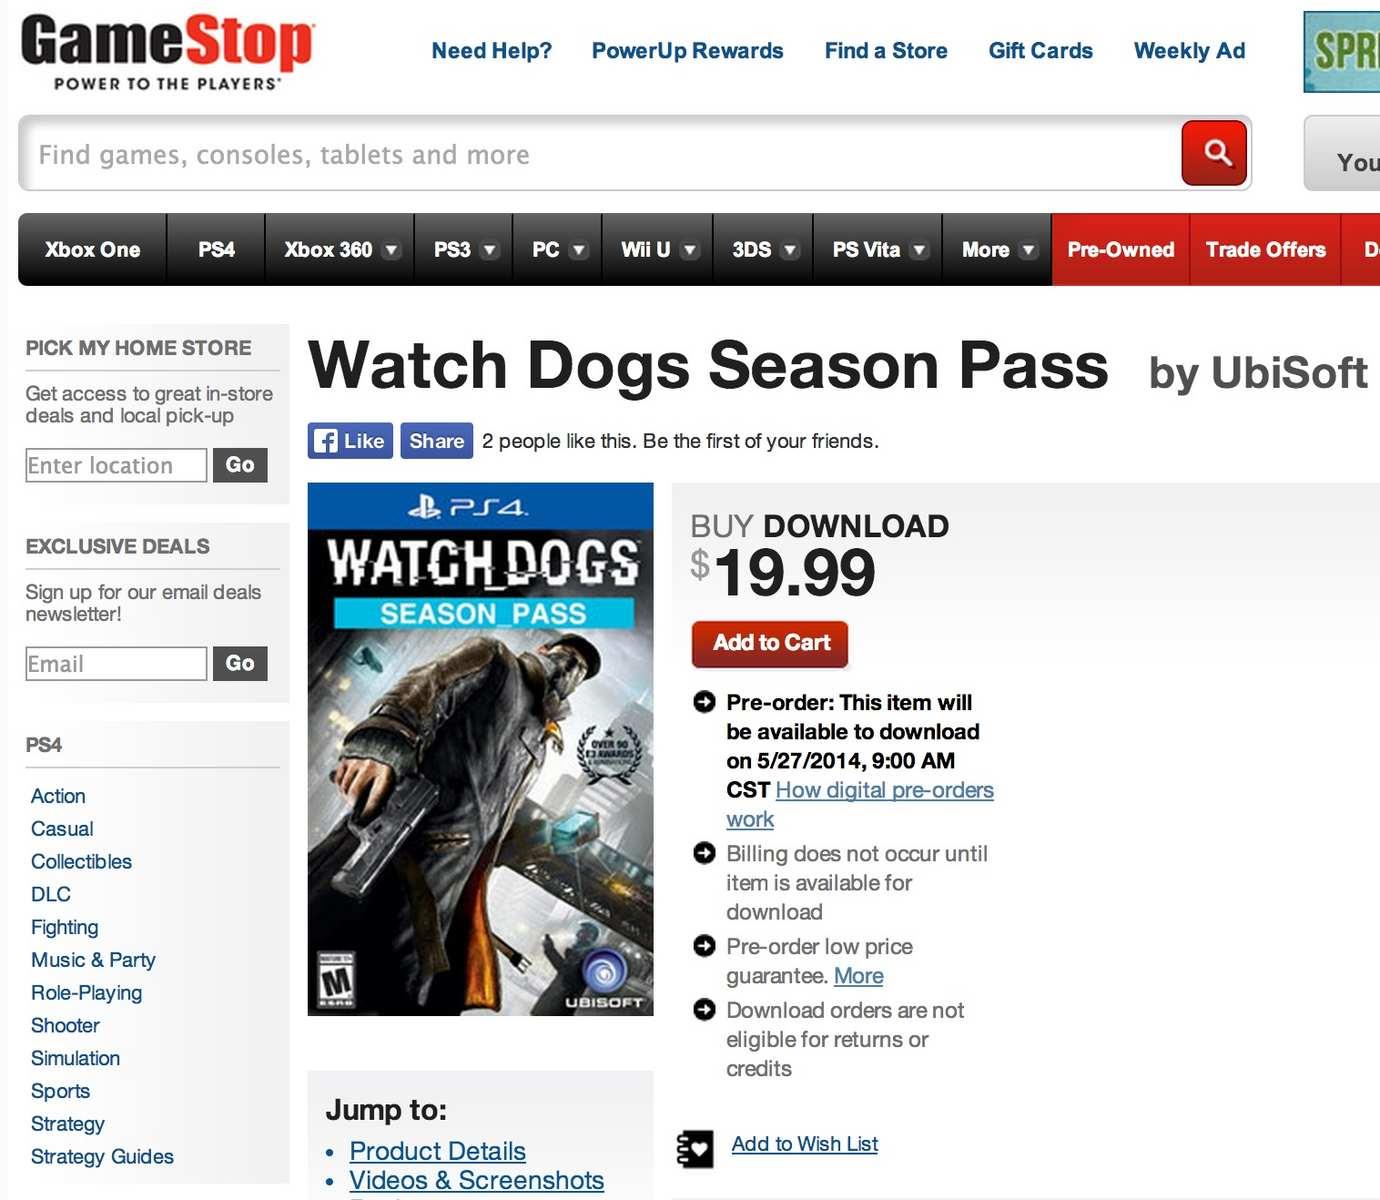 Watch Dogs Seasson Pass con personaje nuevo